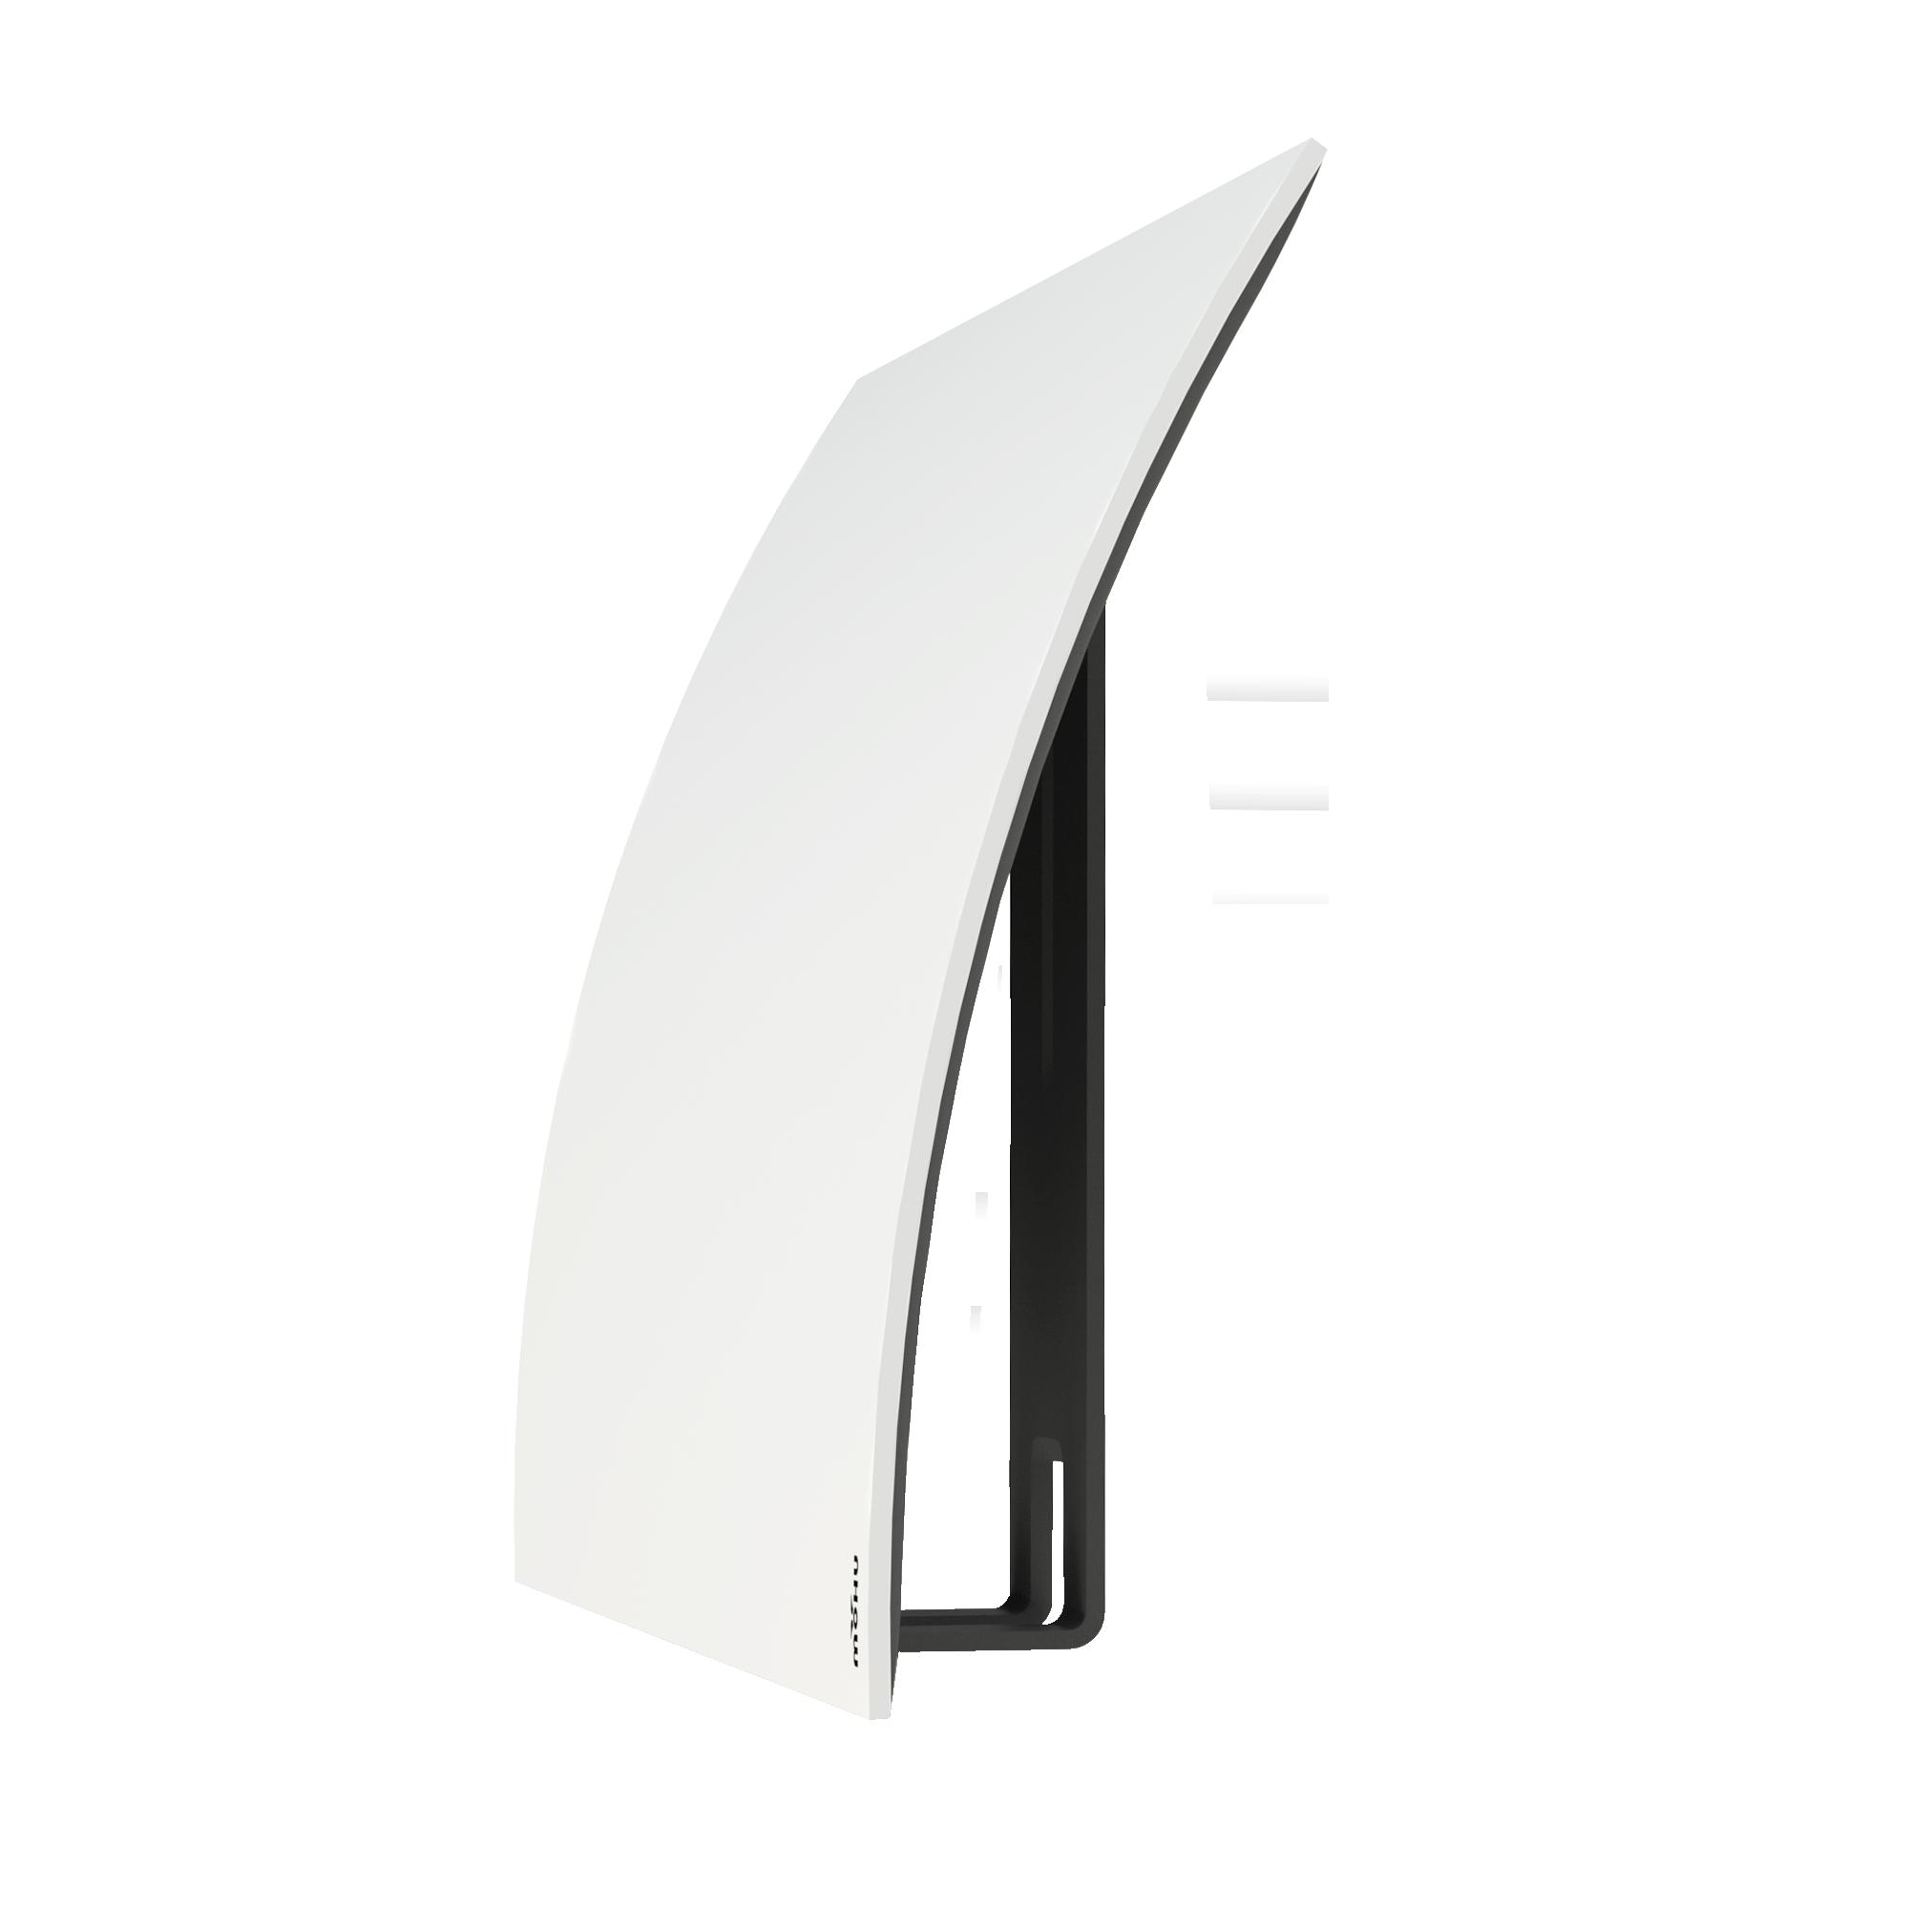 Mohu Spotlight: Curve 30 Indoor HDTV Antenna Blends Form